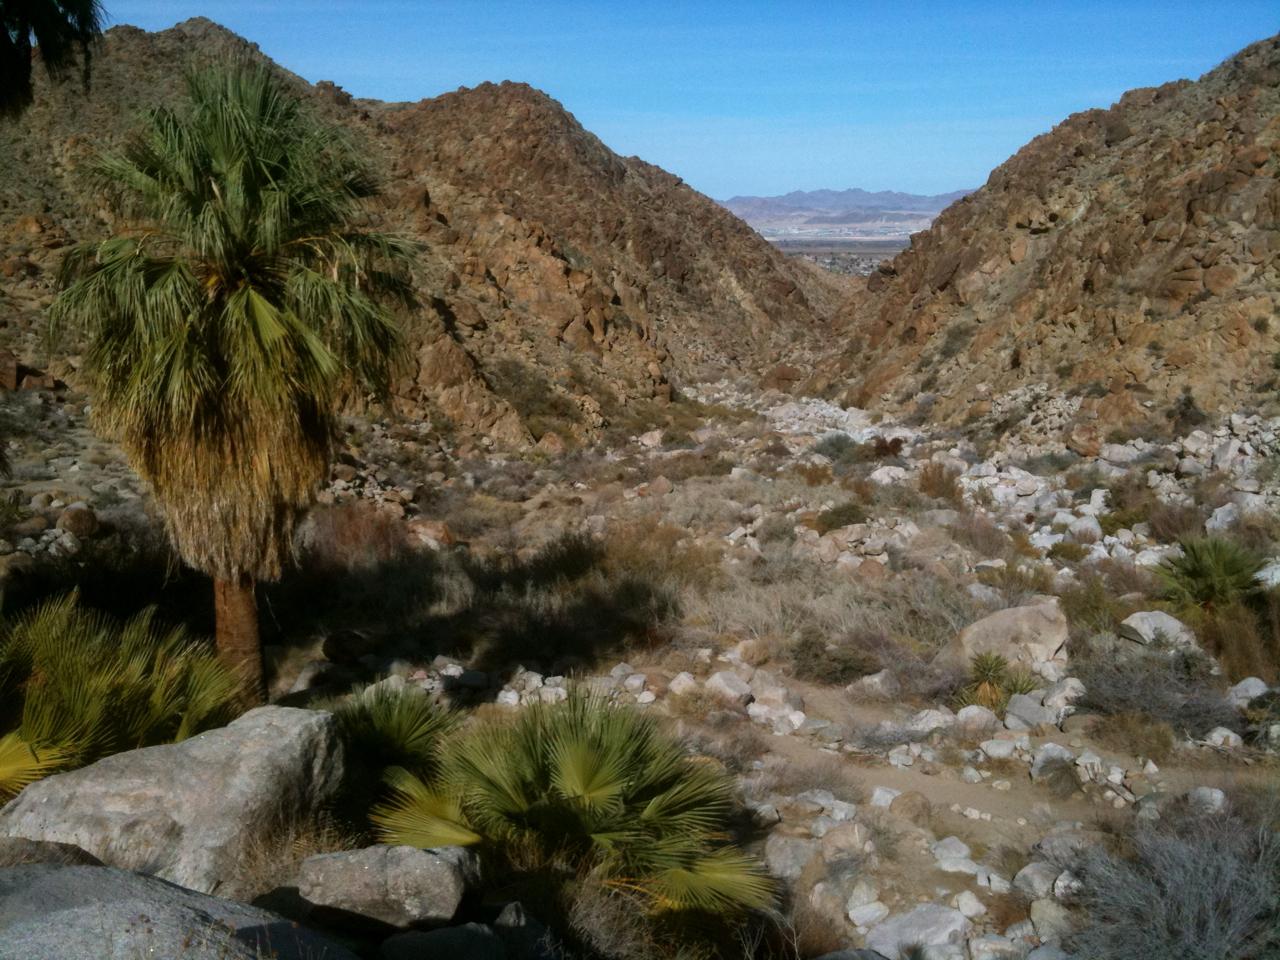 49 Palms Oasis Trail – Joshua Tree National Park, California